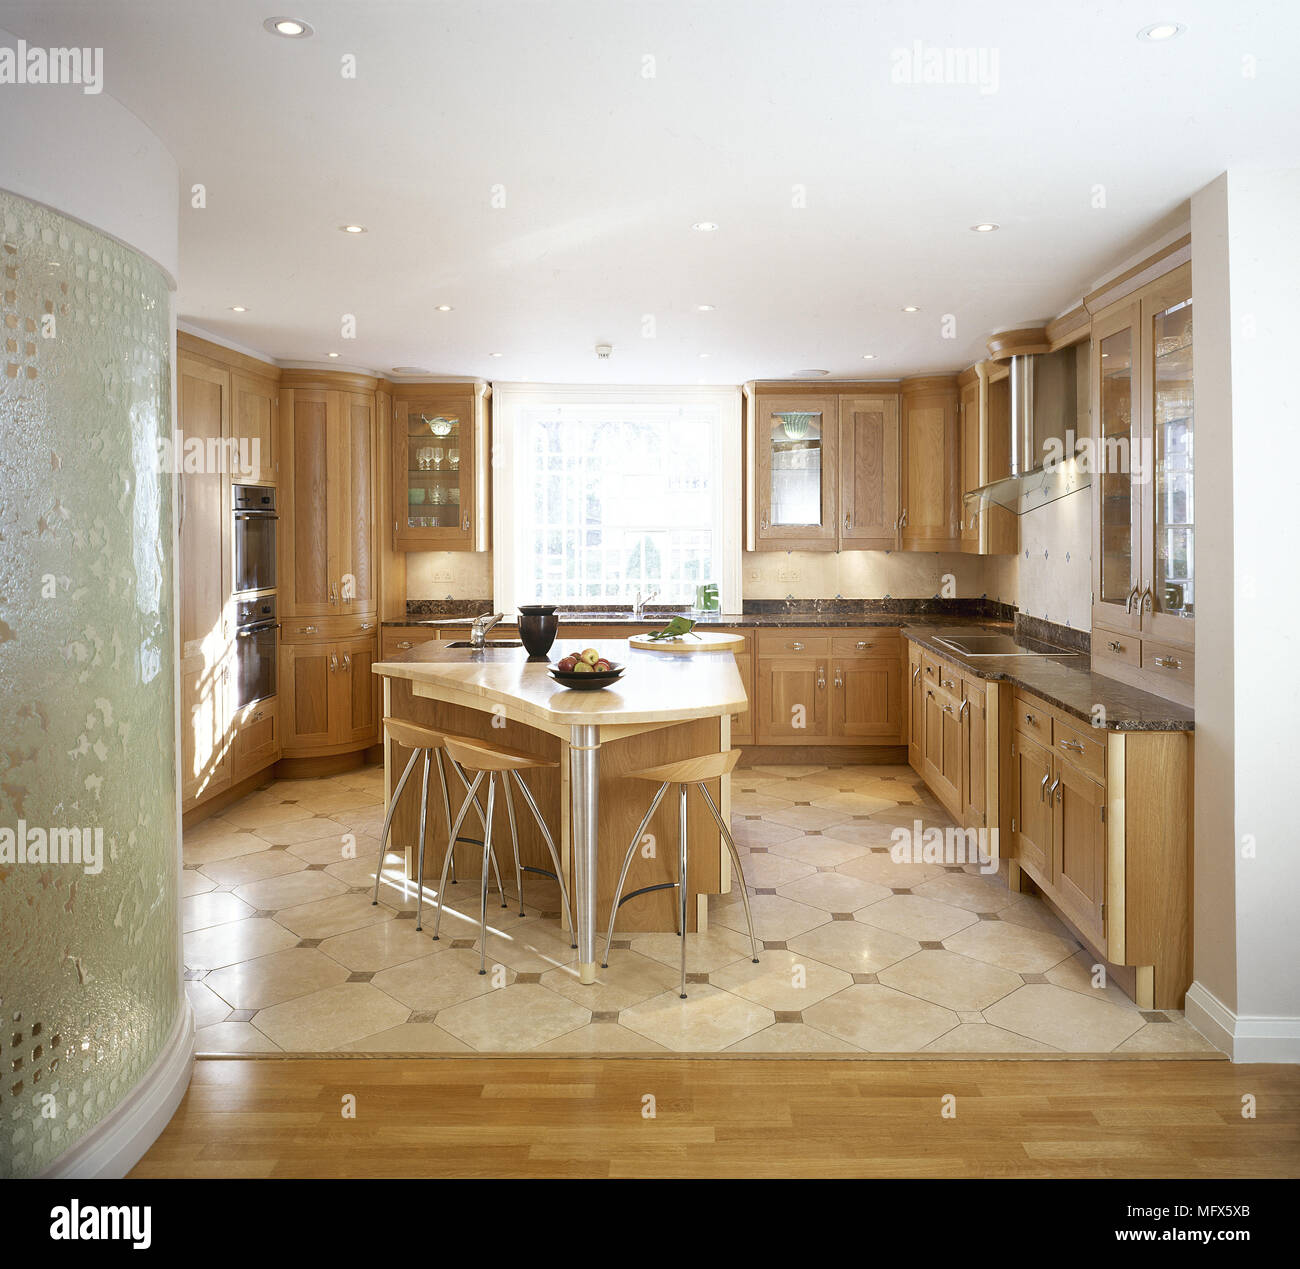 Recessed Lighting Stockfotos & Recessed Lighting Bilder - Alamy